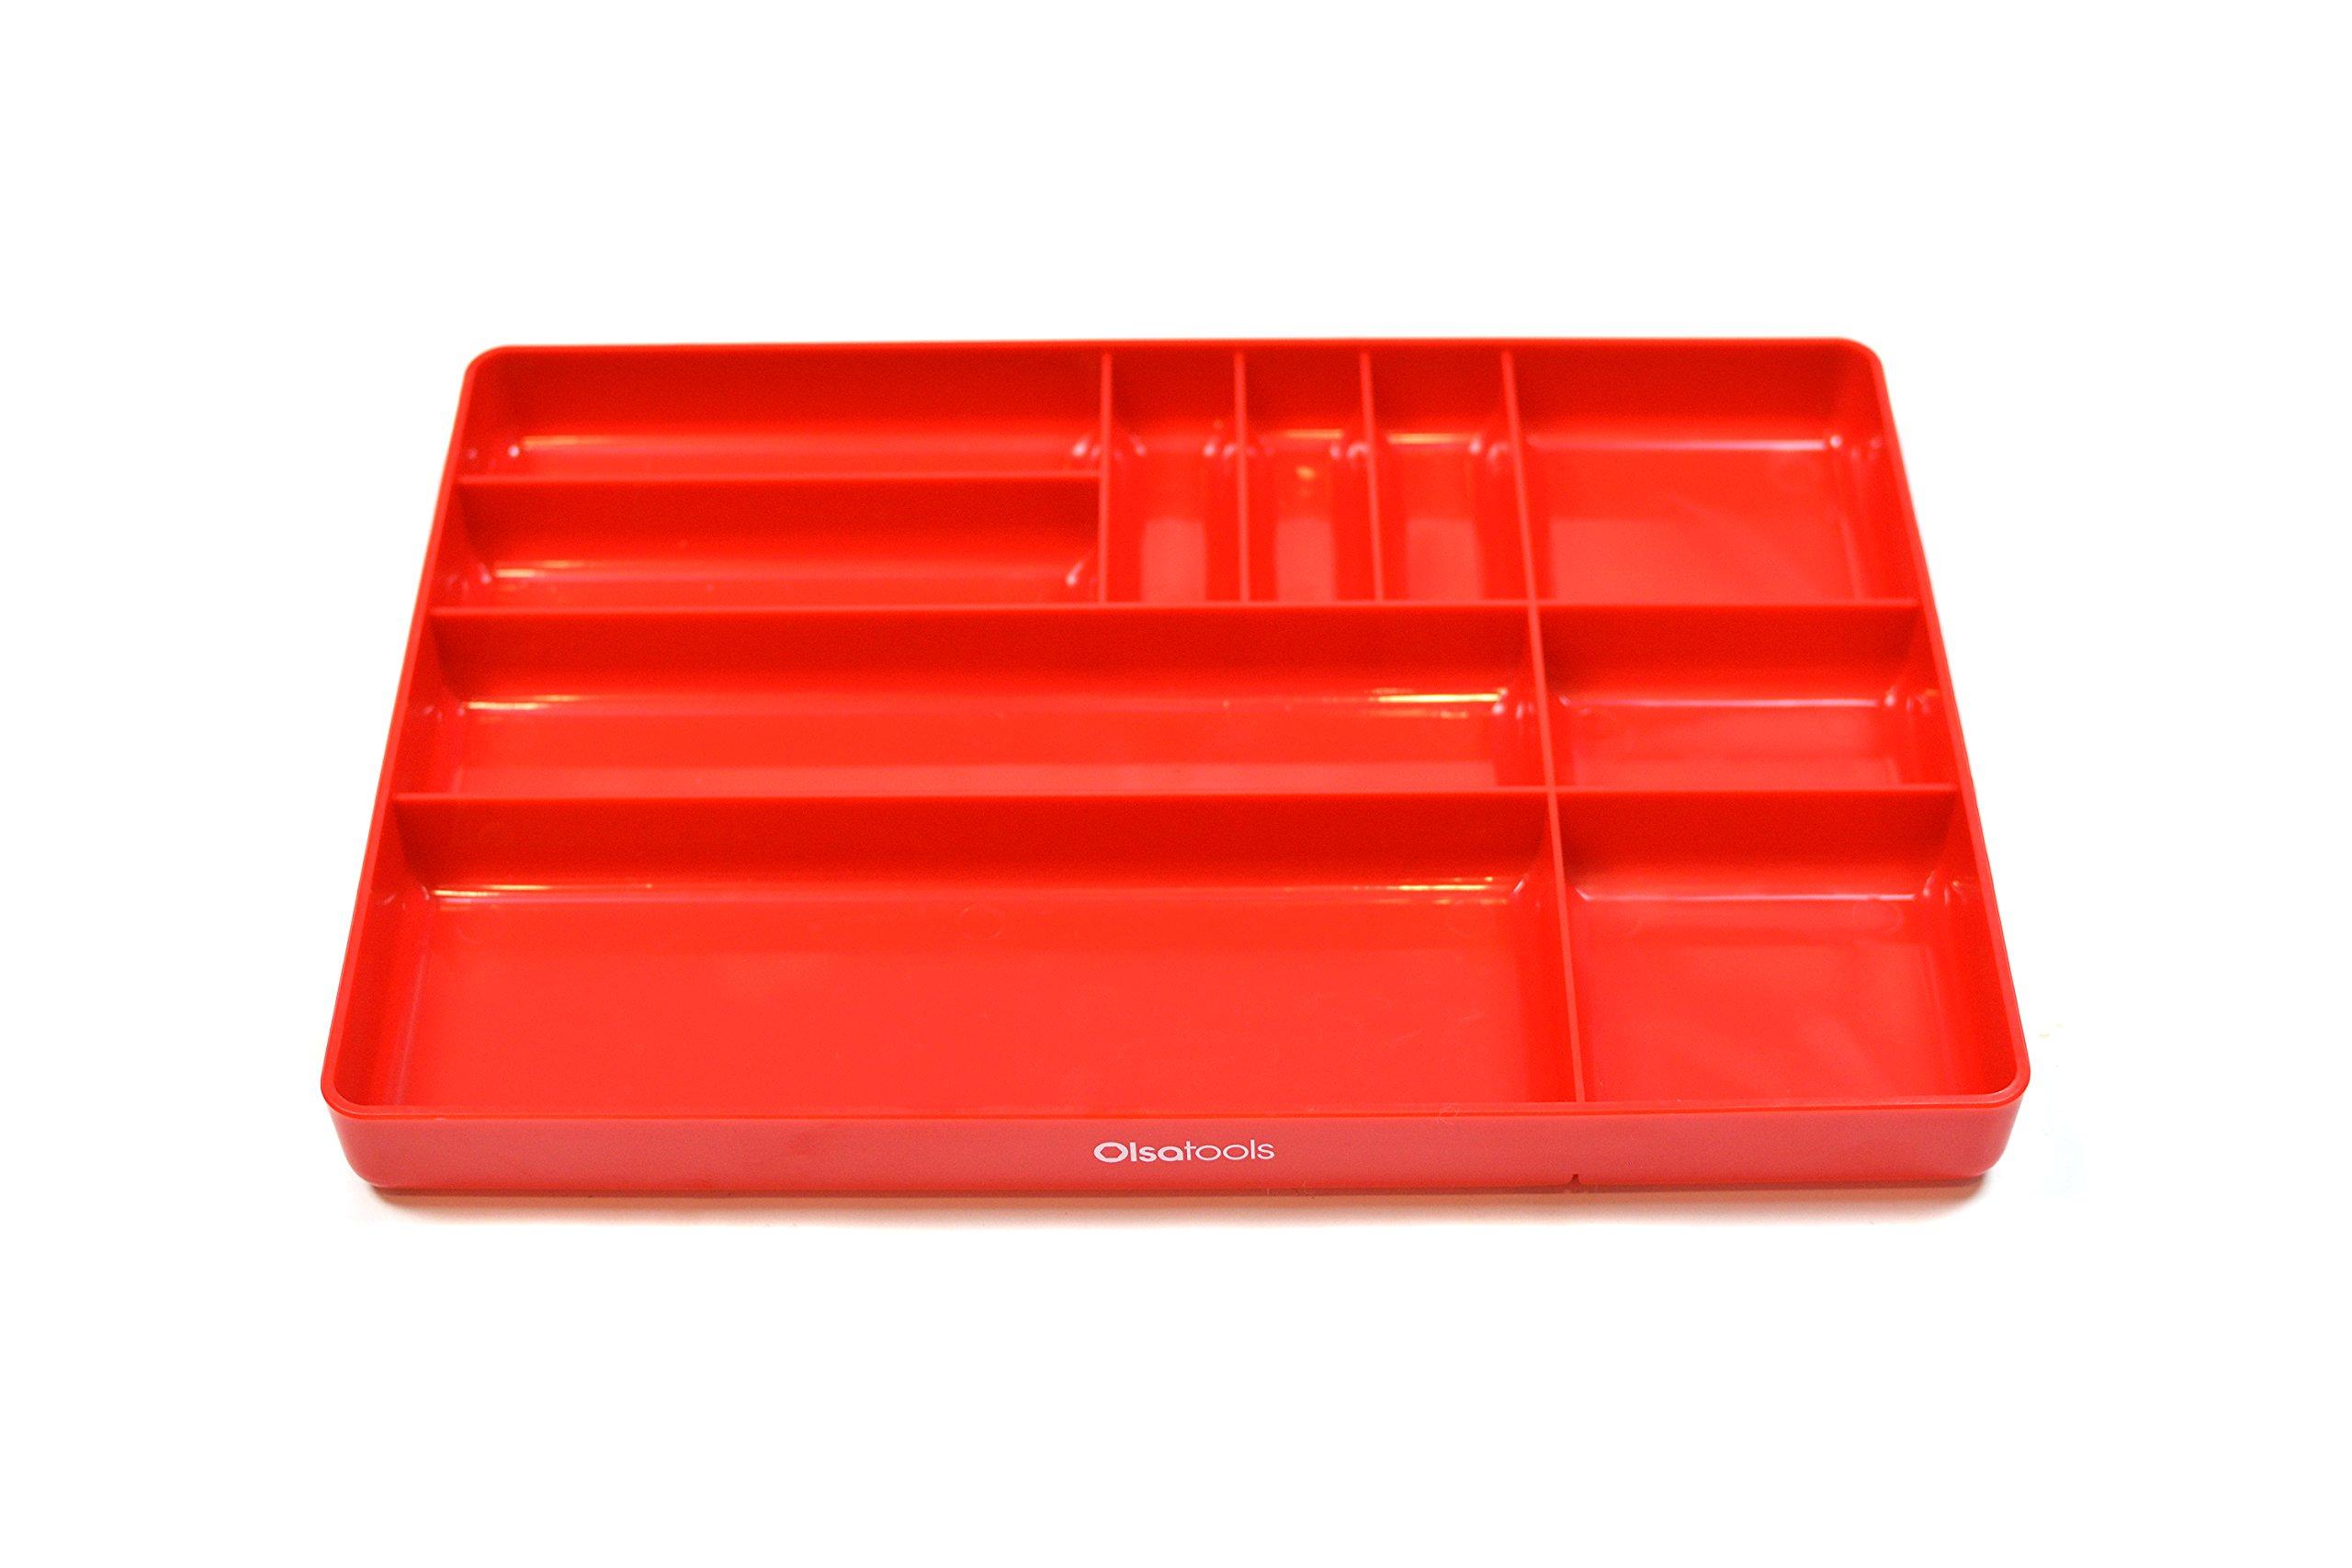 Olsa Tools | Tool Box Organizer Tray | Parts Organizer Tray for Small Parts & Tools | 10-Compartments (RED)